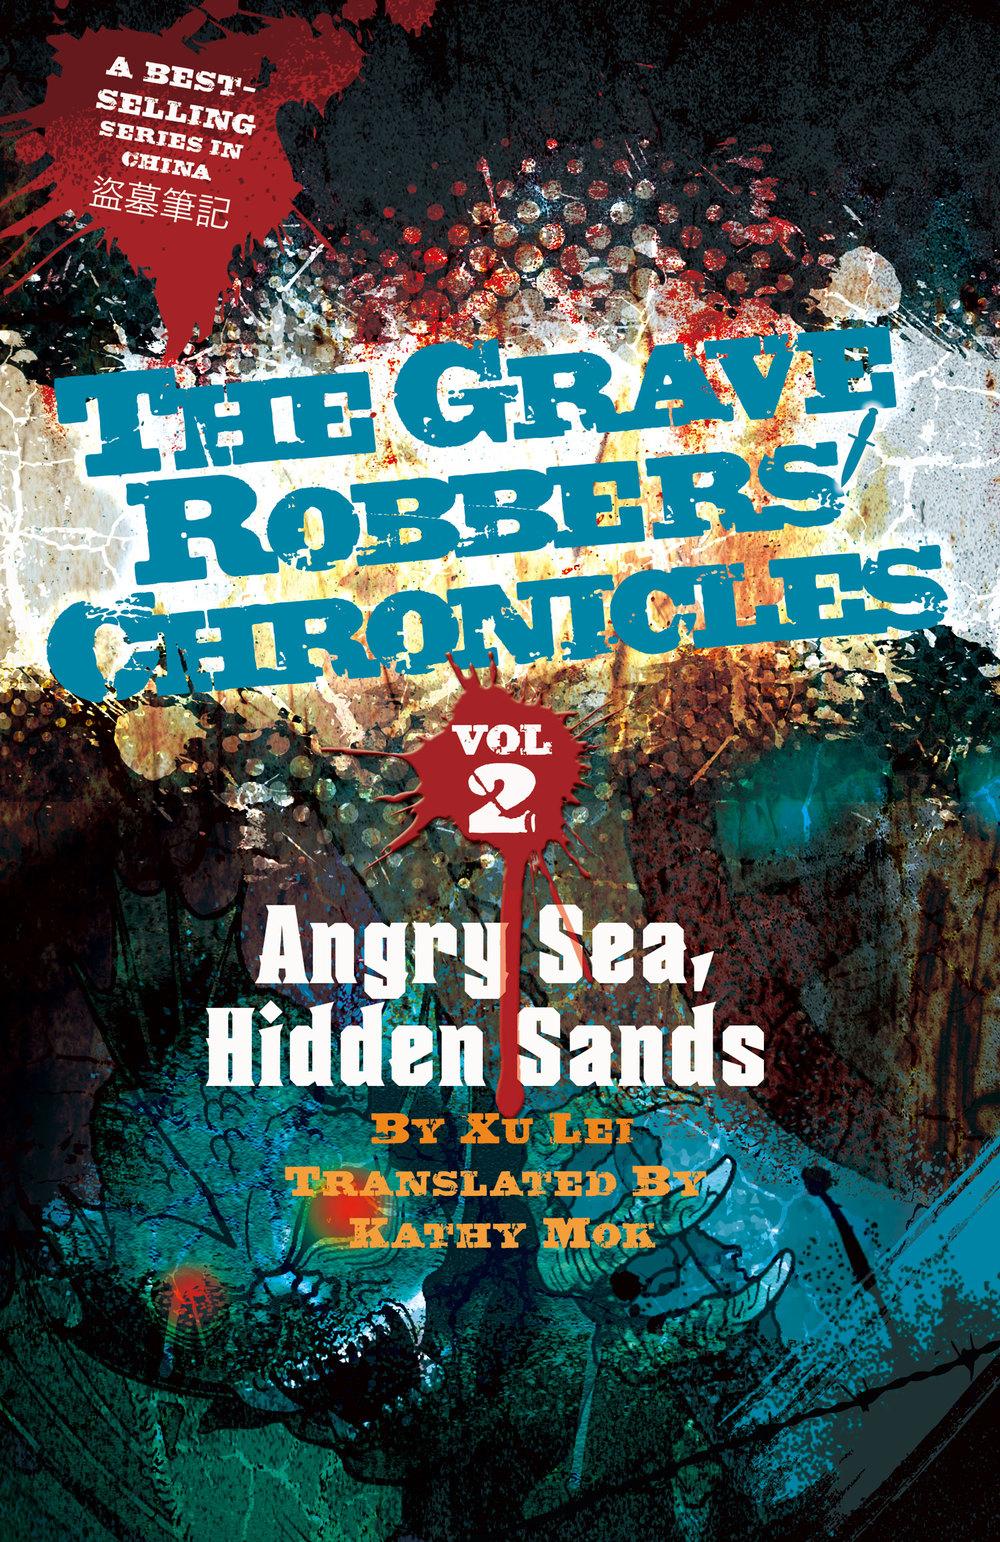 Vol. 2: Angry Sea, Hidden Sands